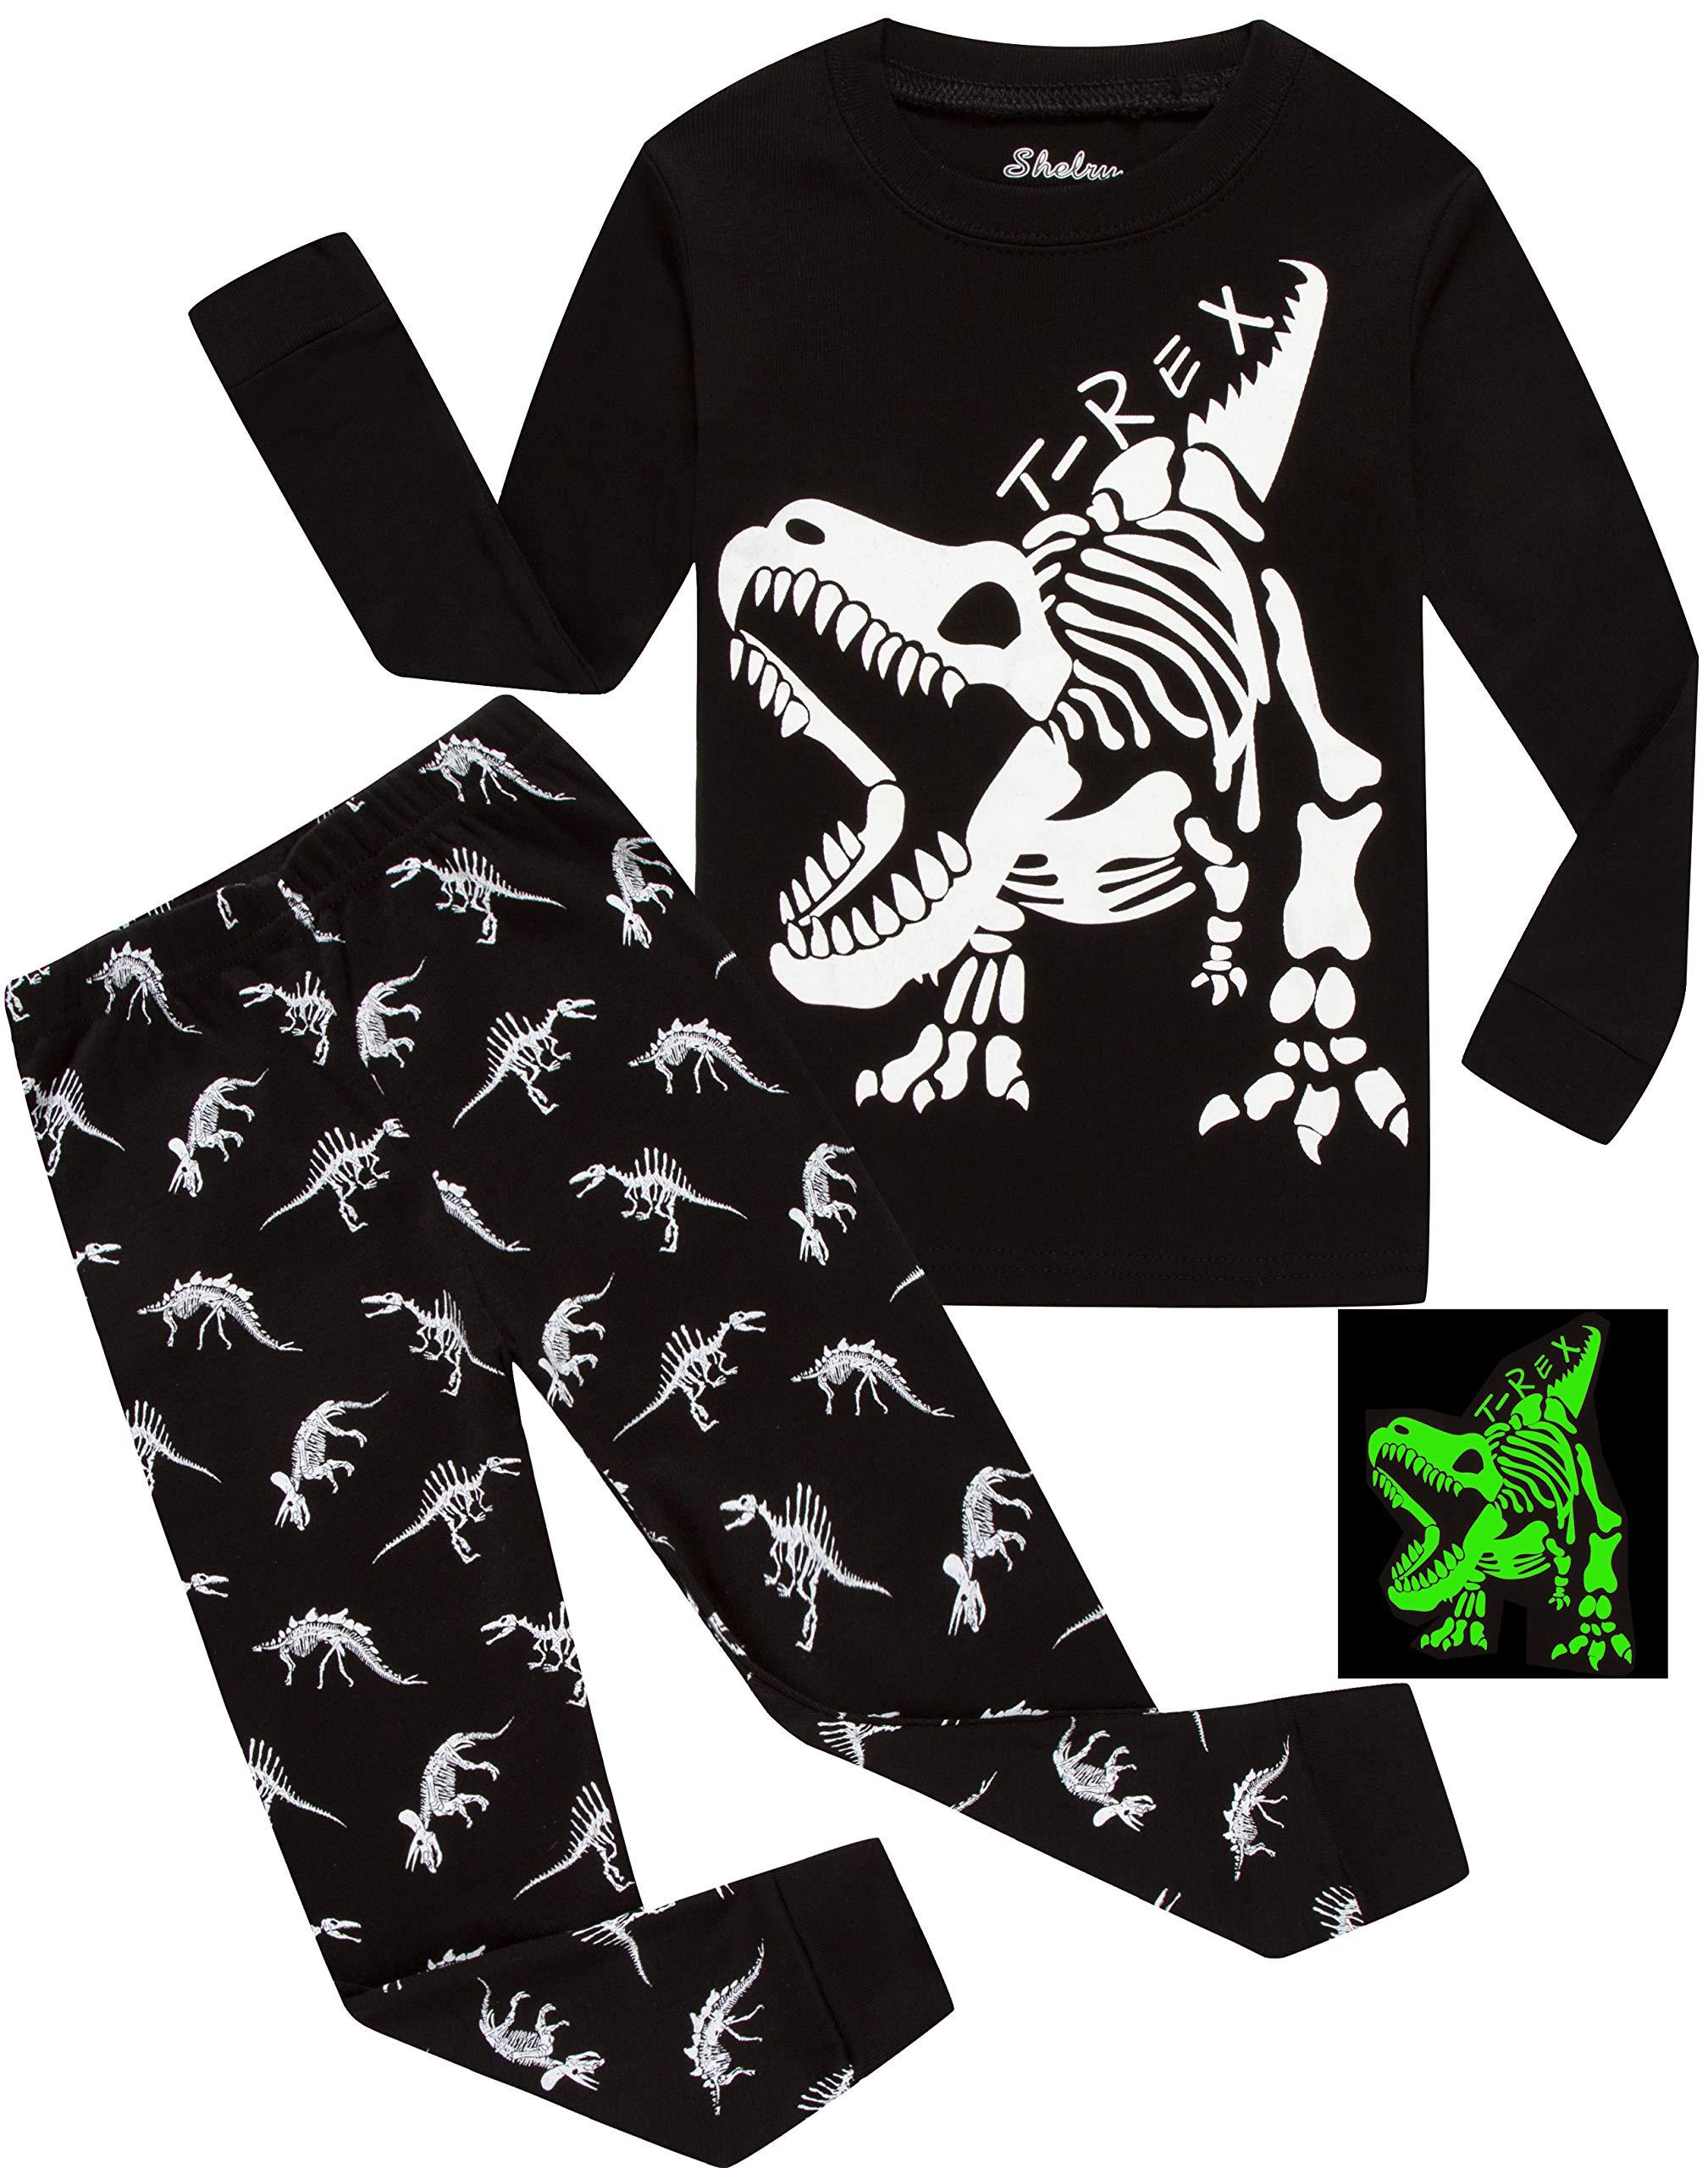 Children Pajamas Boys Glow in Dark Dinosaur Pj Cotton Sleepwear Set Toddler Kids Clothes Size 7